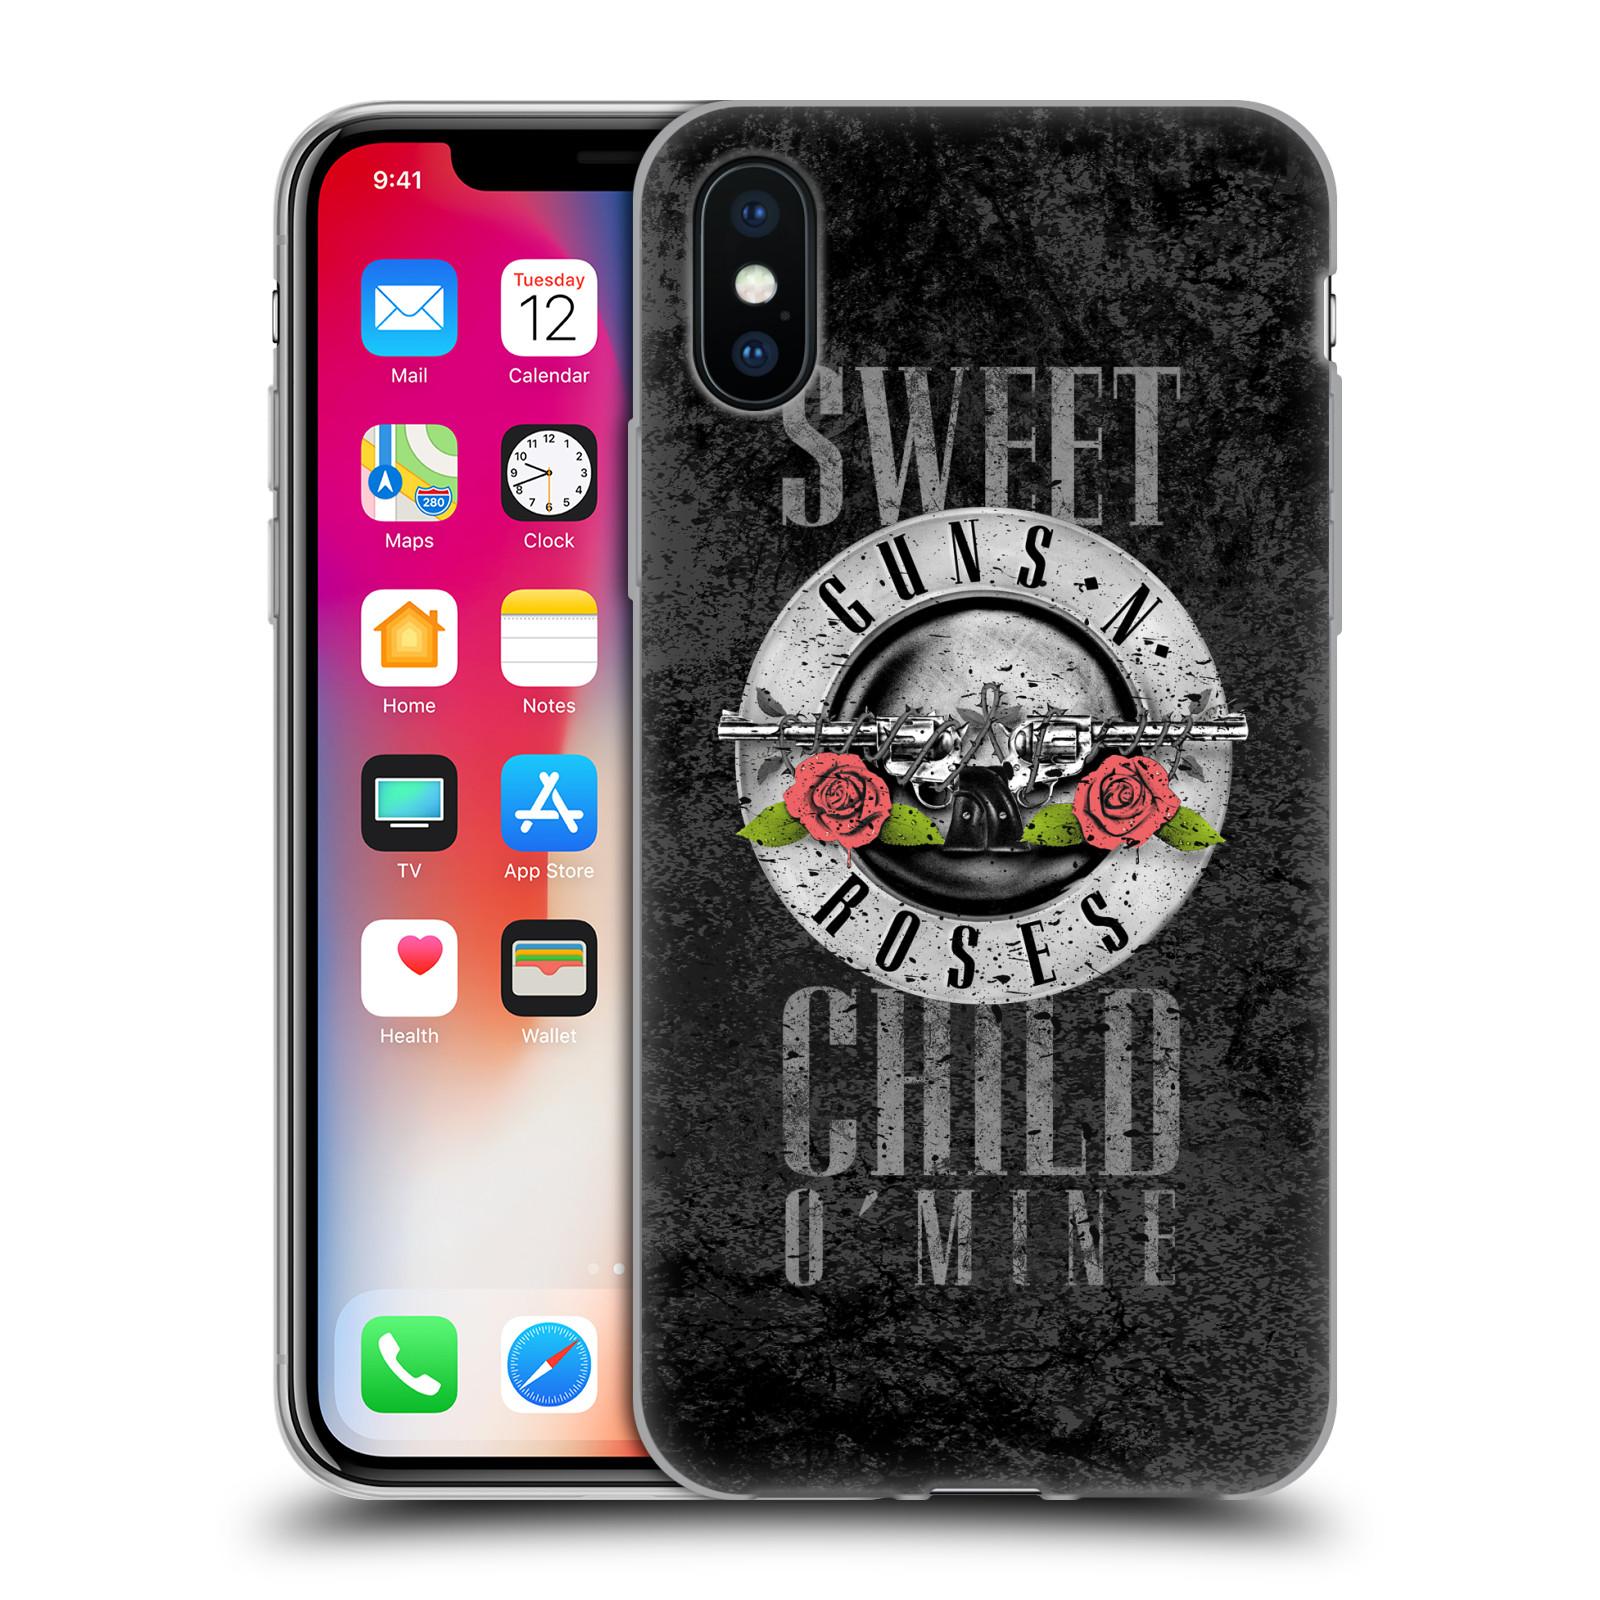 Silikonové pouzdro na mobil Apple iPhone XS - Head Case - Guns N' Roses - Sweet Child